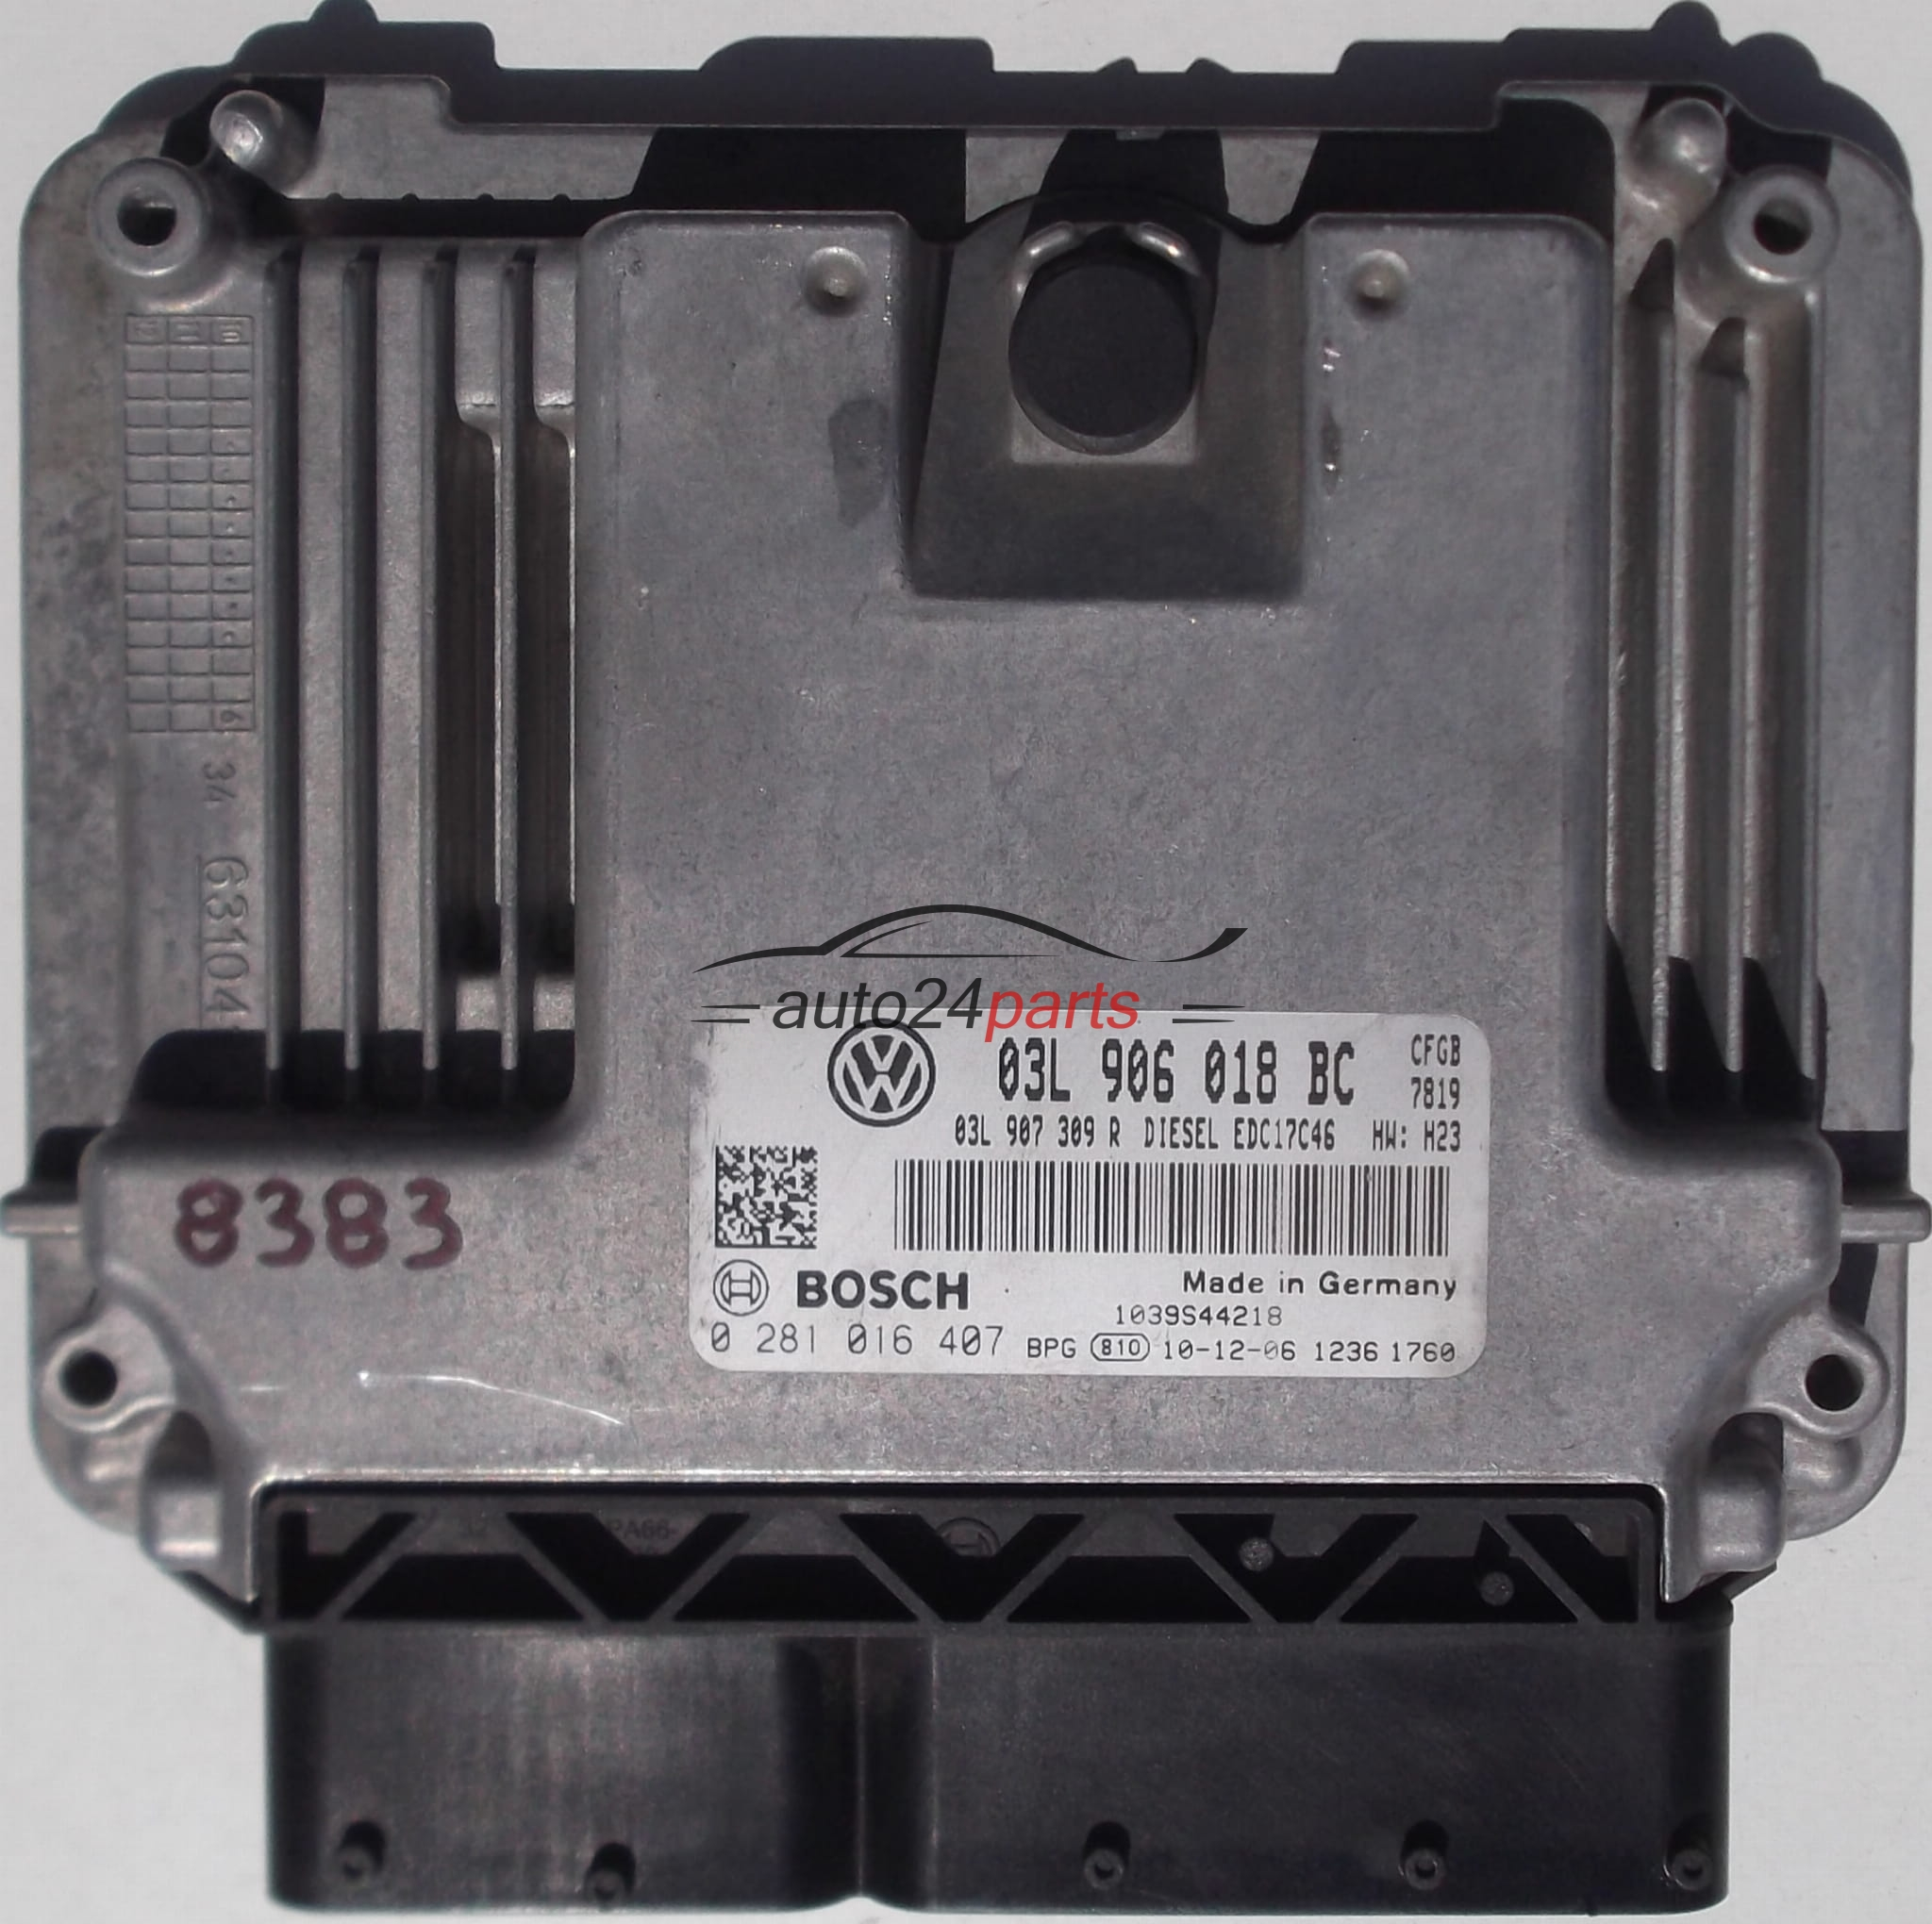 ECU ENGINE CONTROLLER VW VOLKSWAGEN GOLF VI 2 0 TDI, BOSCH 0 281 016 407,  BOSCH 0281016407, 03L 906 018 BC, 03L906018BC, 1039S44218